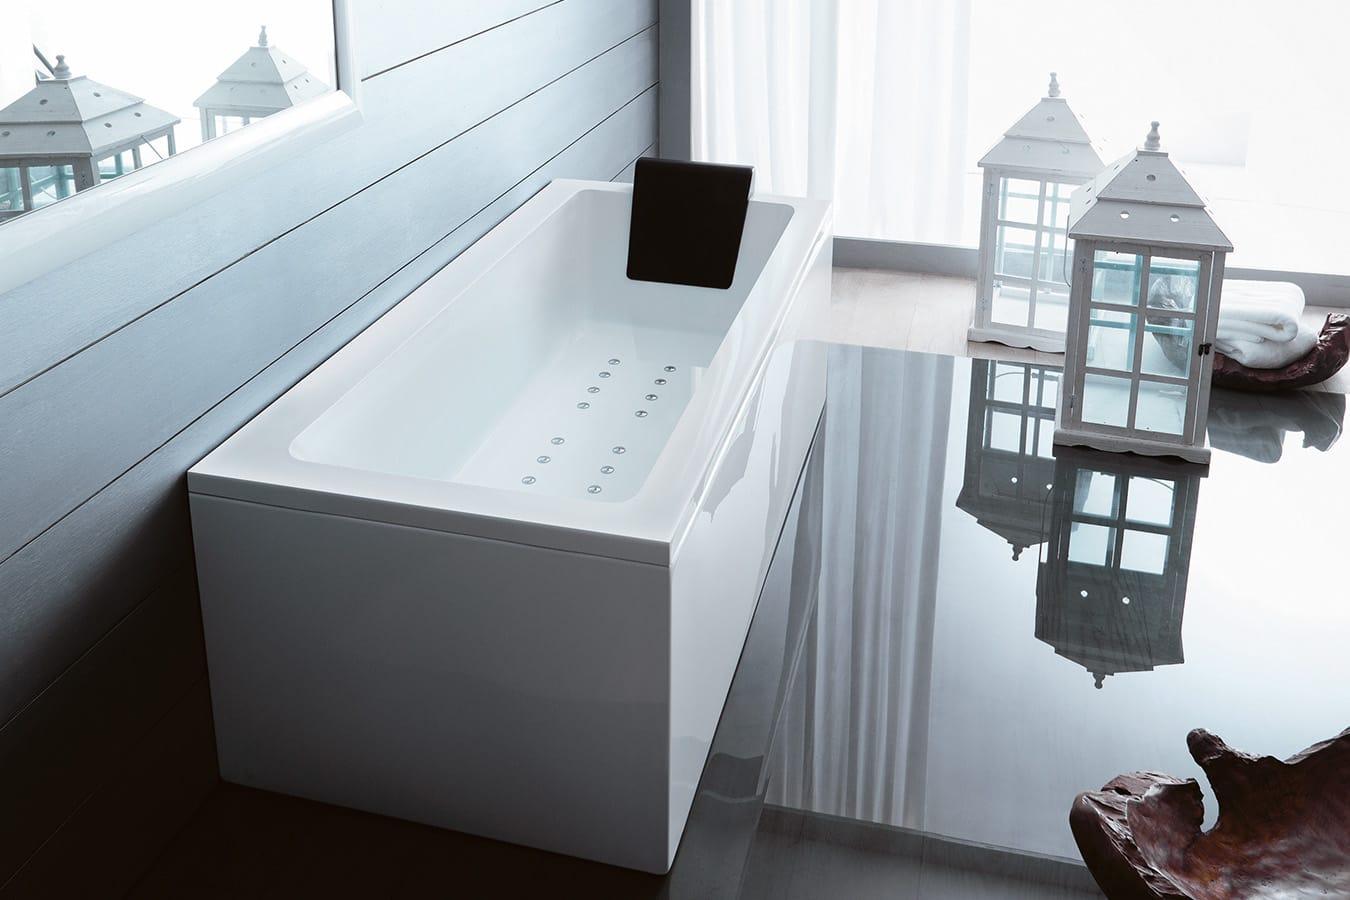 Vasca Da Bagno Incasso 150x70 : Vasca da bagno da incasso in acrilico linares mat velvet